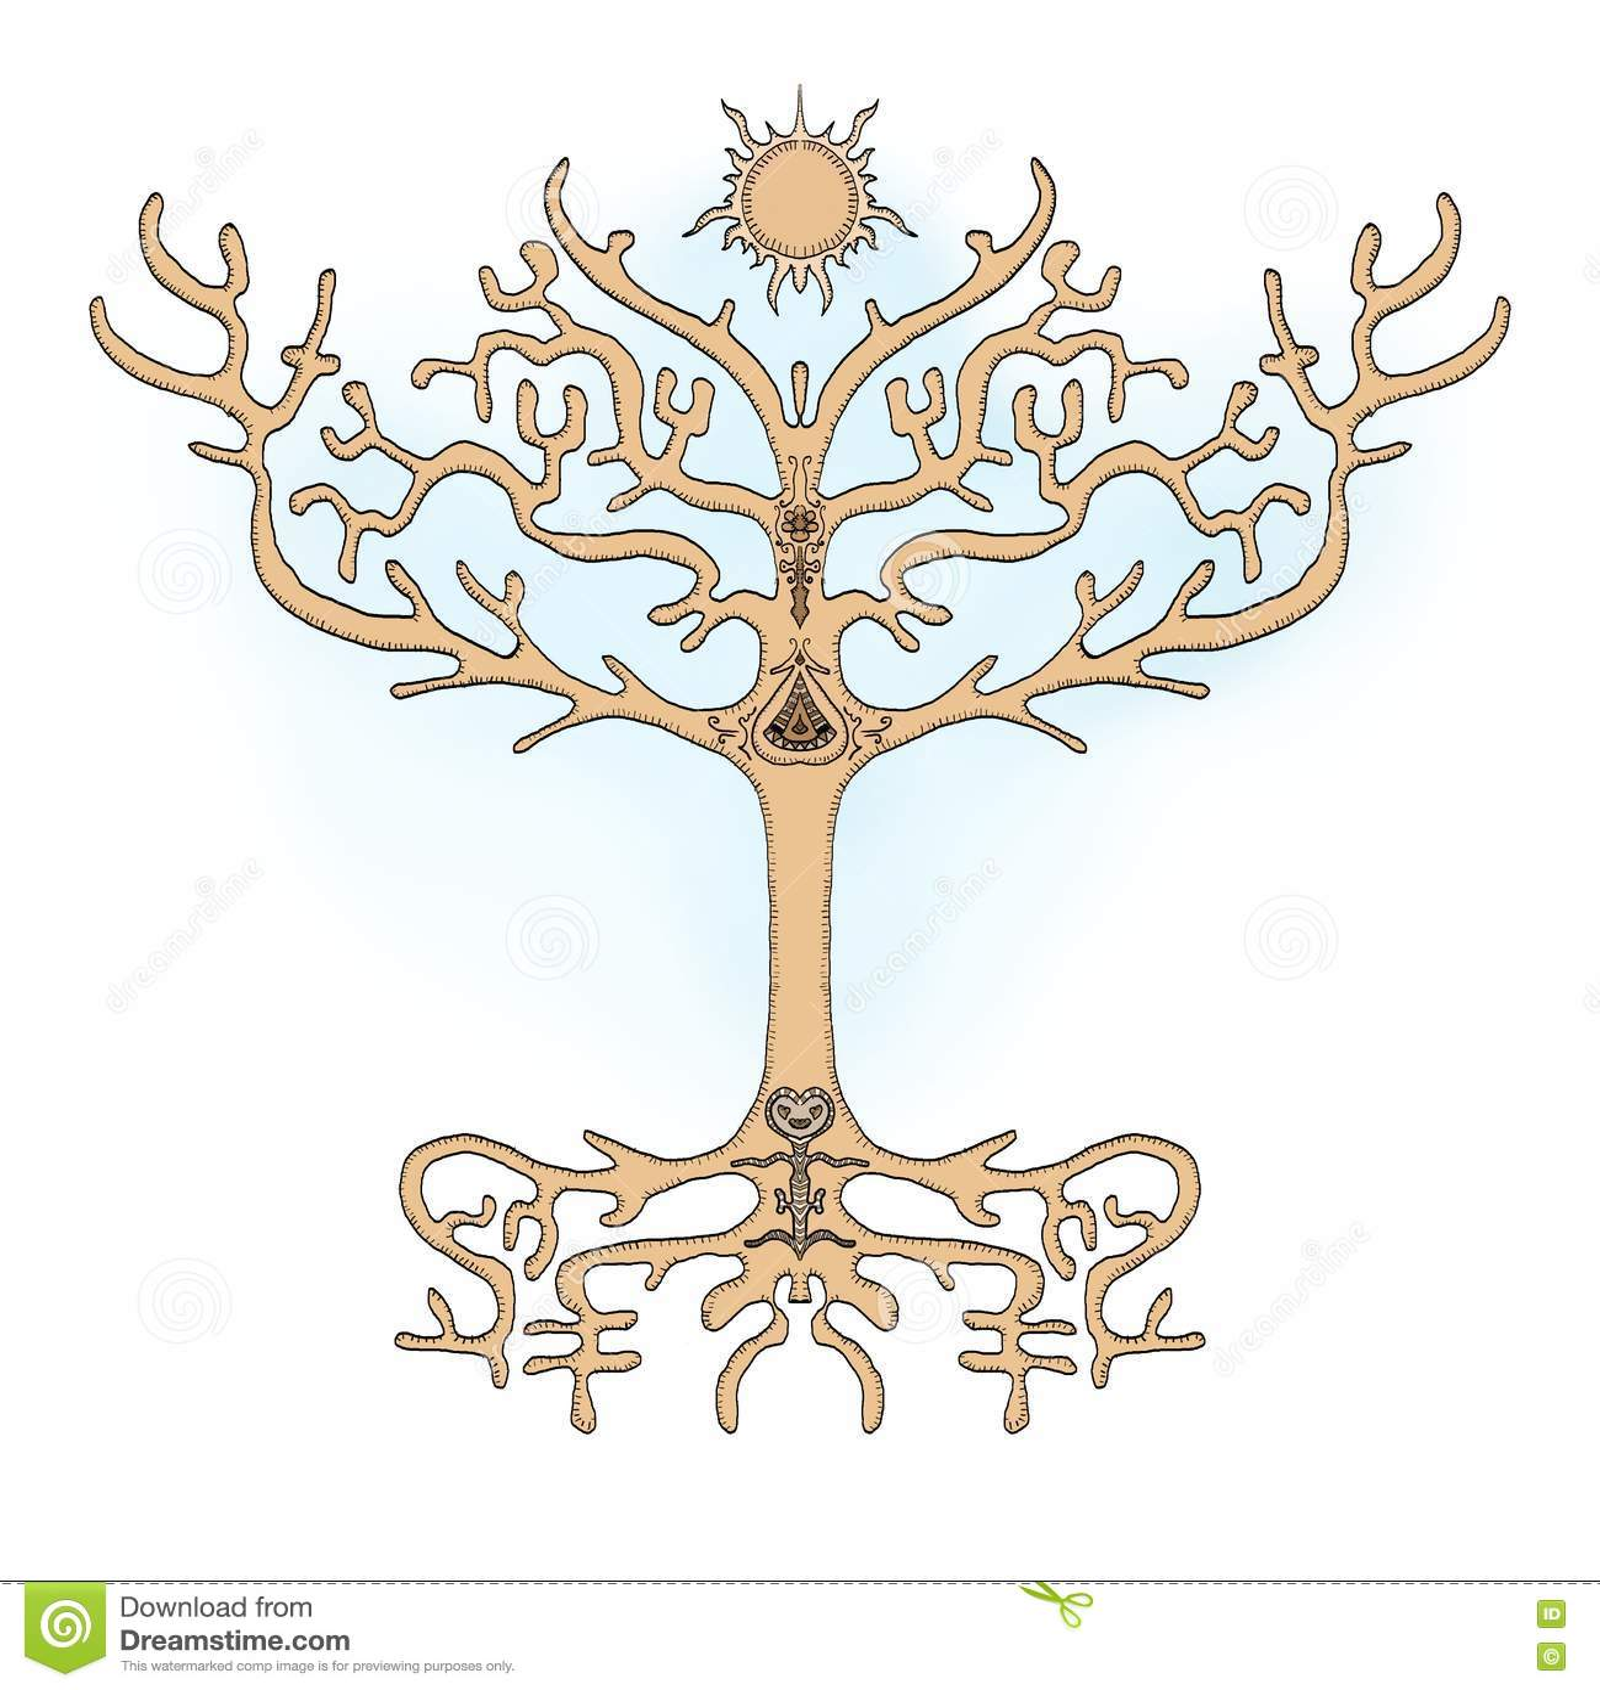 Tree of life ornament - Tree Of Life Symmetric Ornament